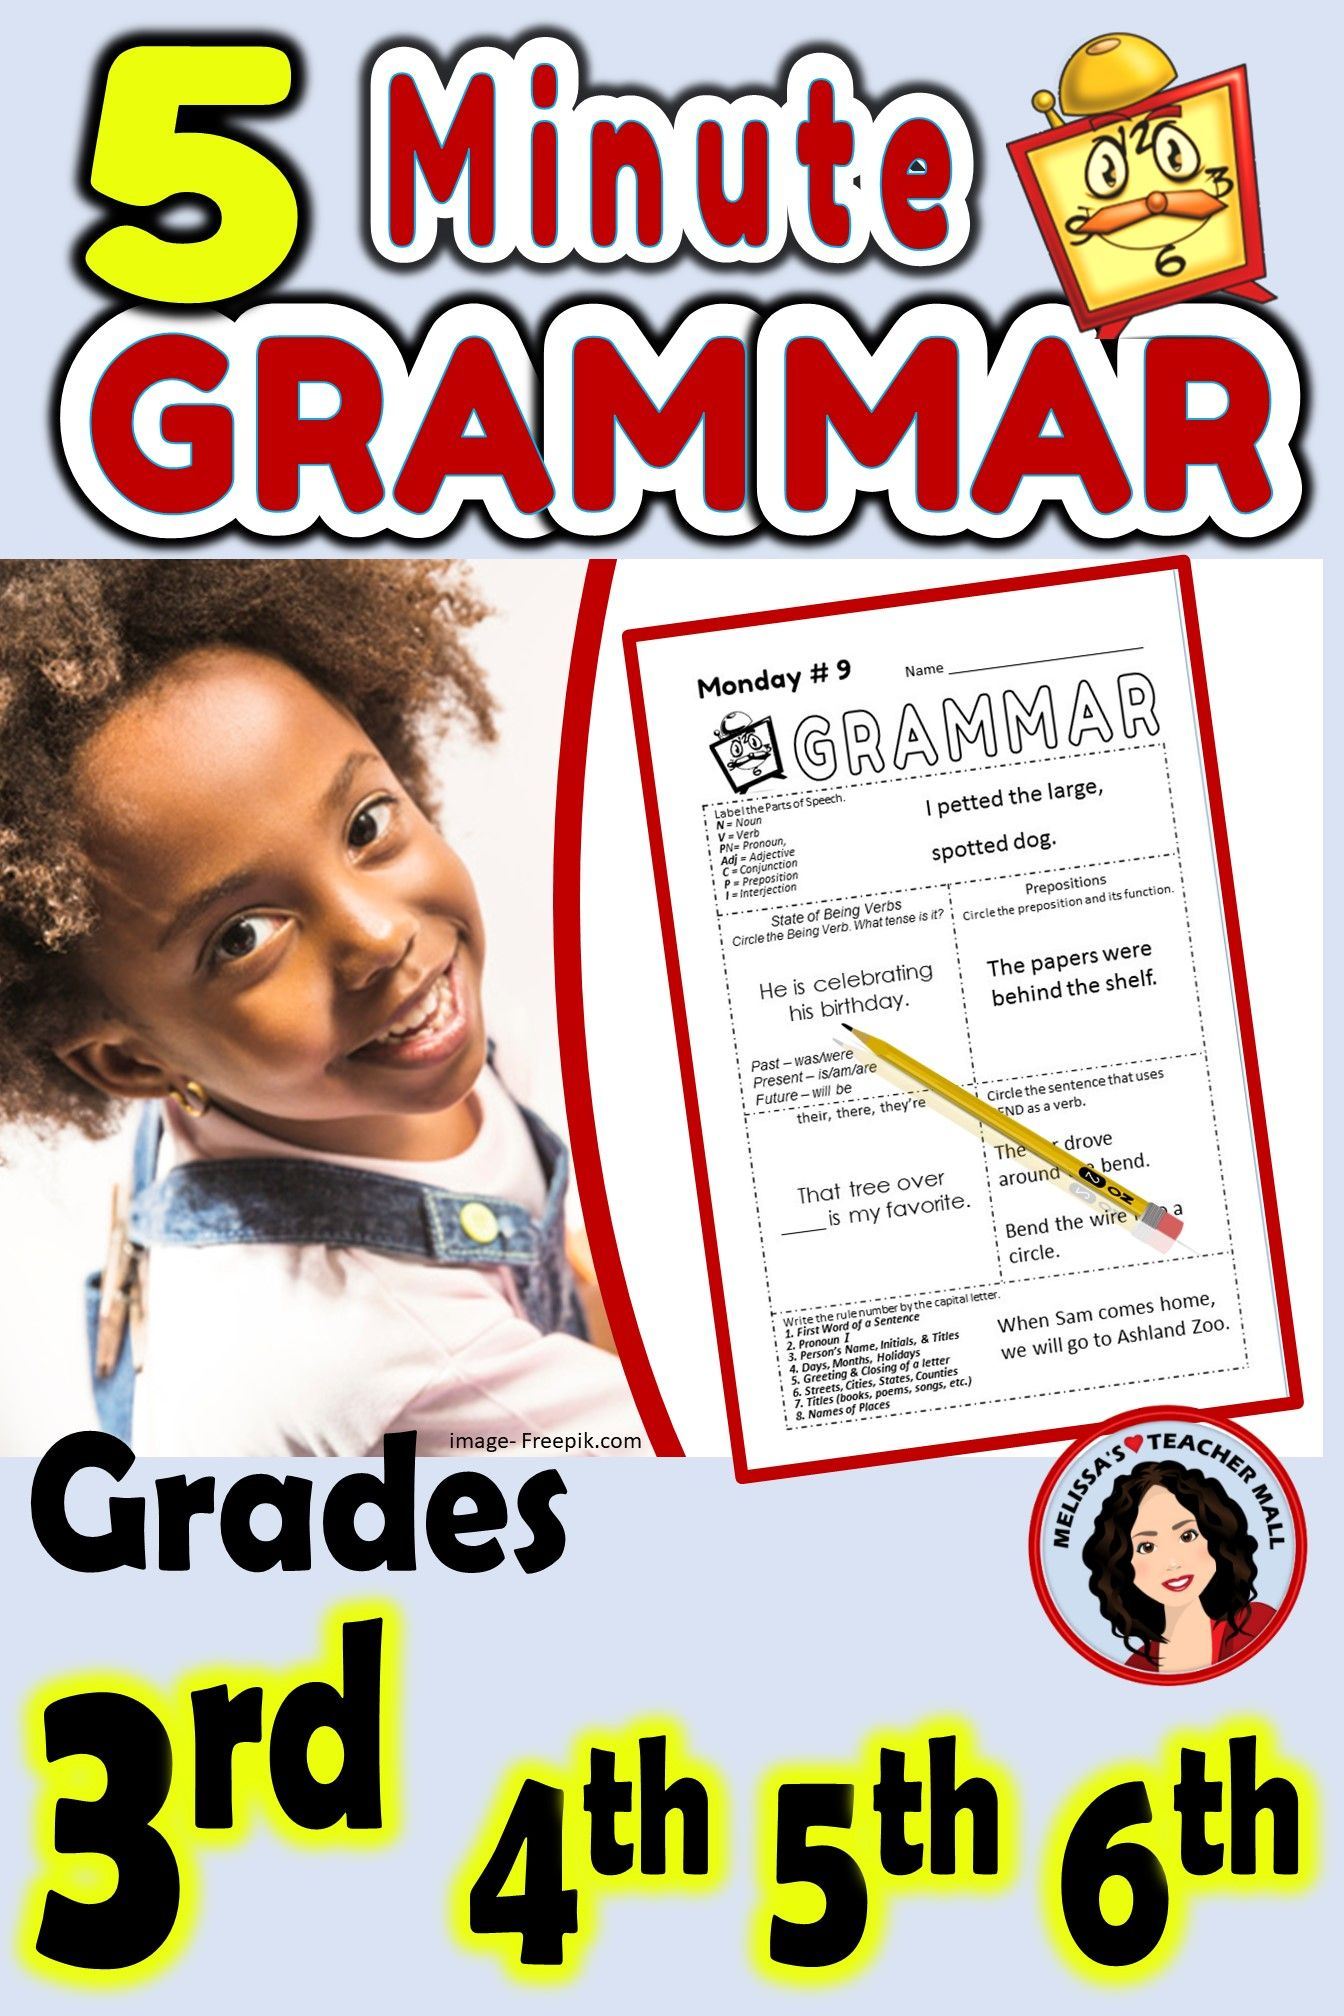 5 Minute Grammar Daily Grammar Worksheets 3rd Grade Practice And Assessment Grammar Worksheets Grammar Practice Grammar Instruction